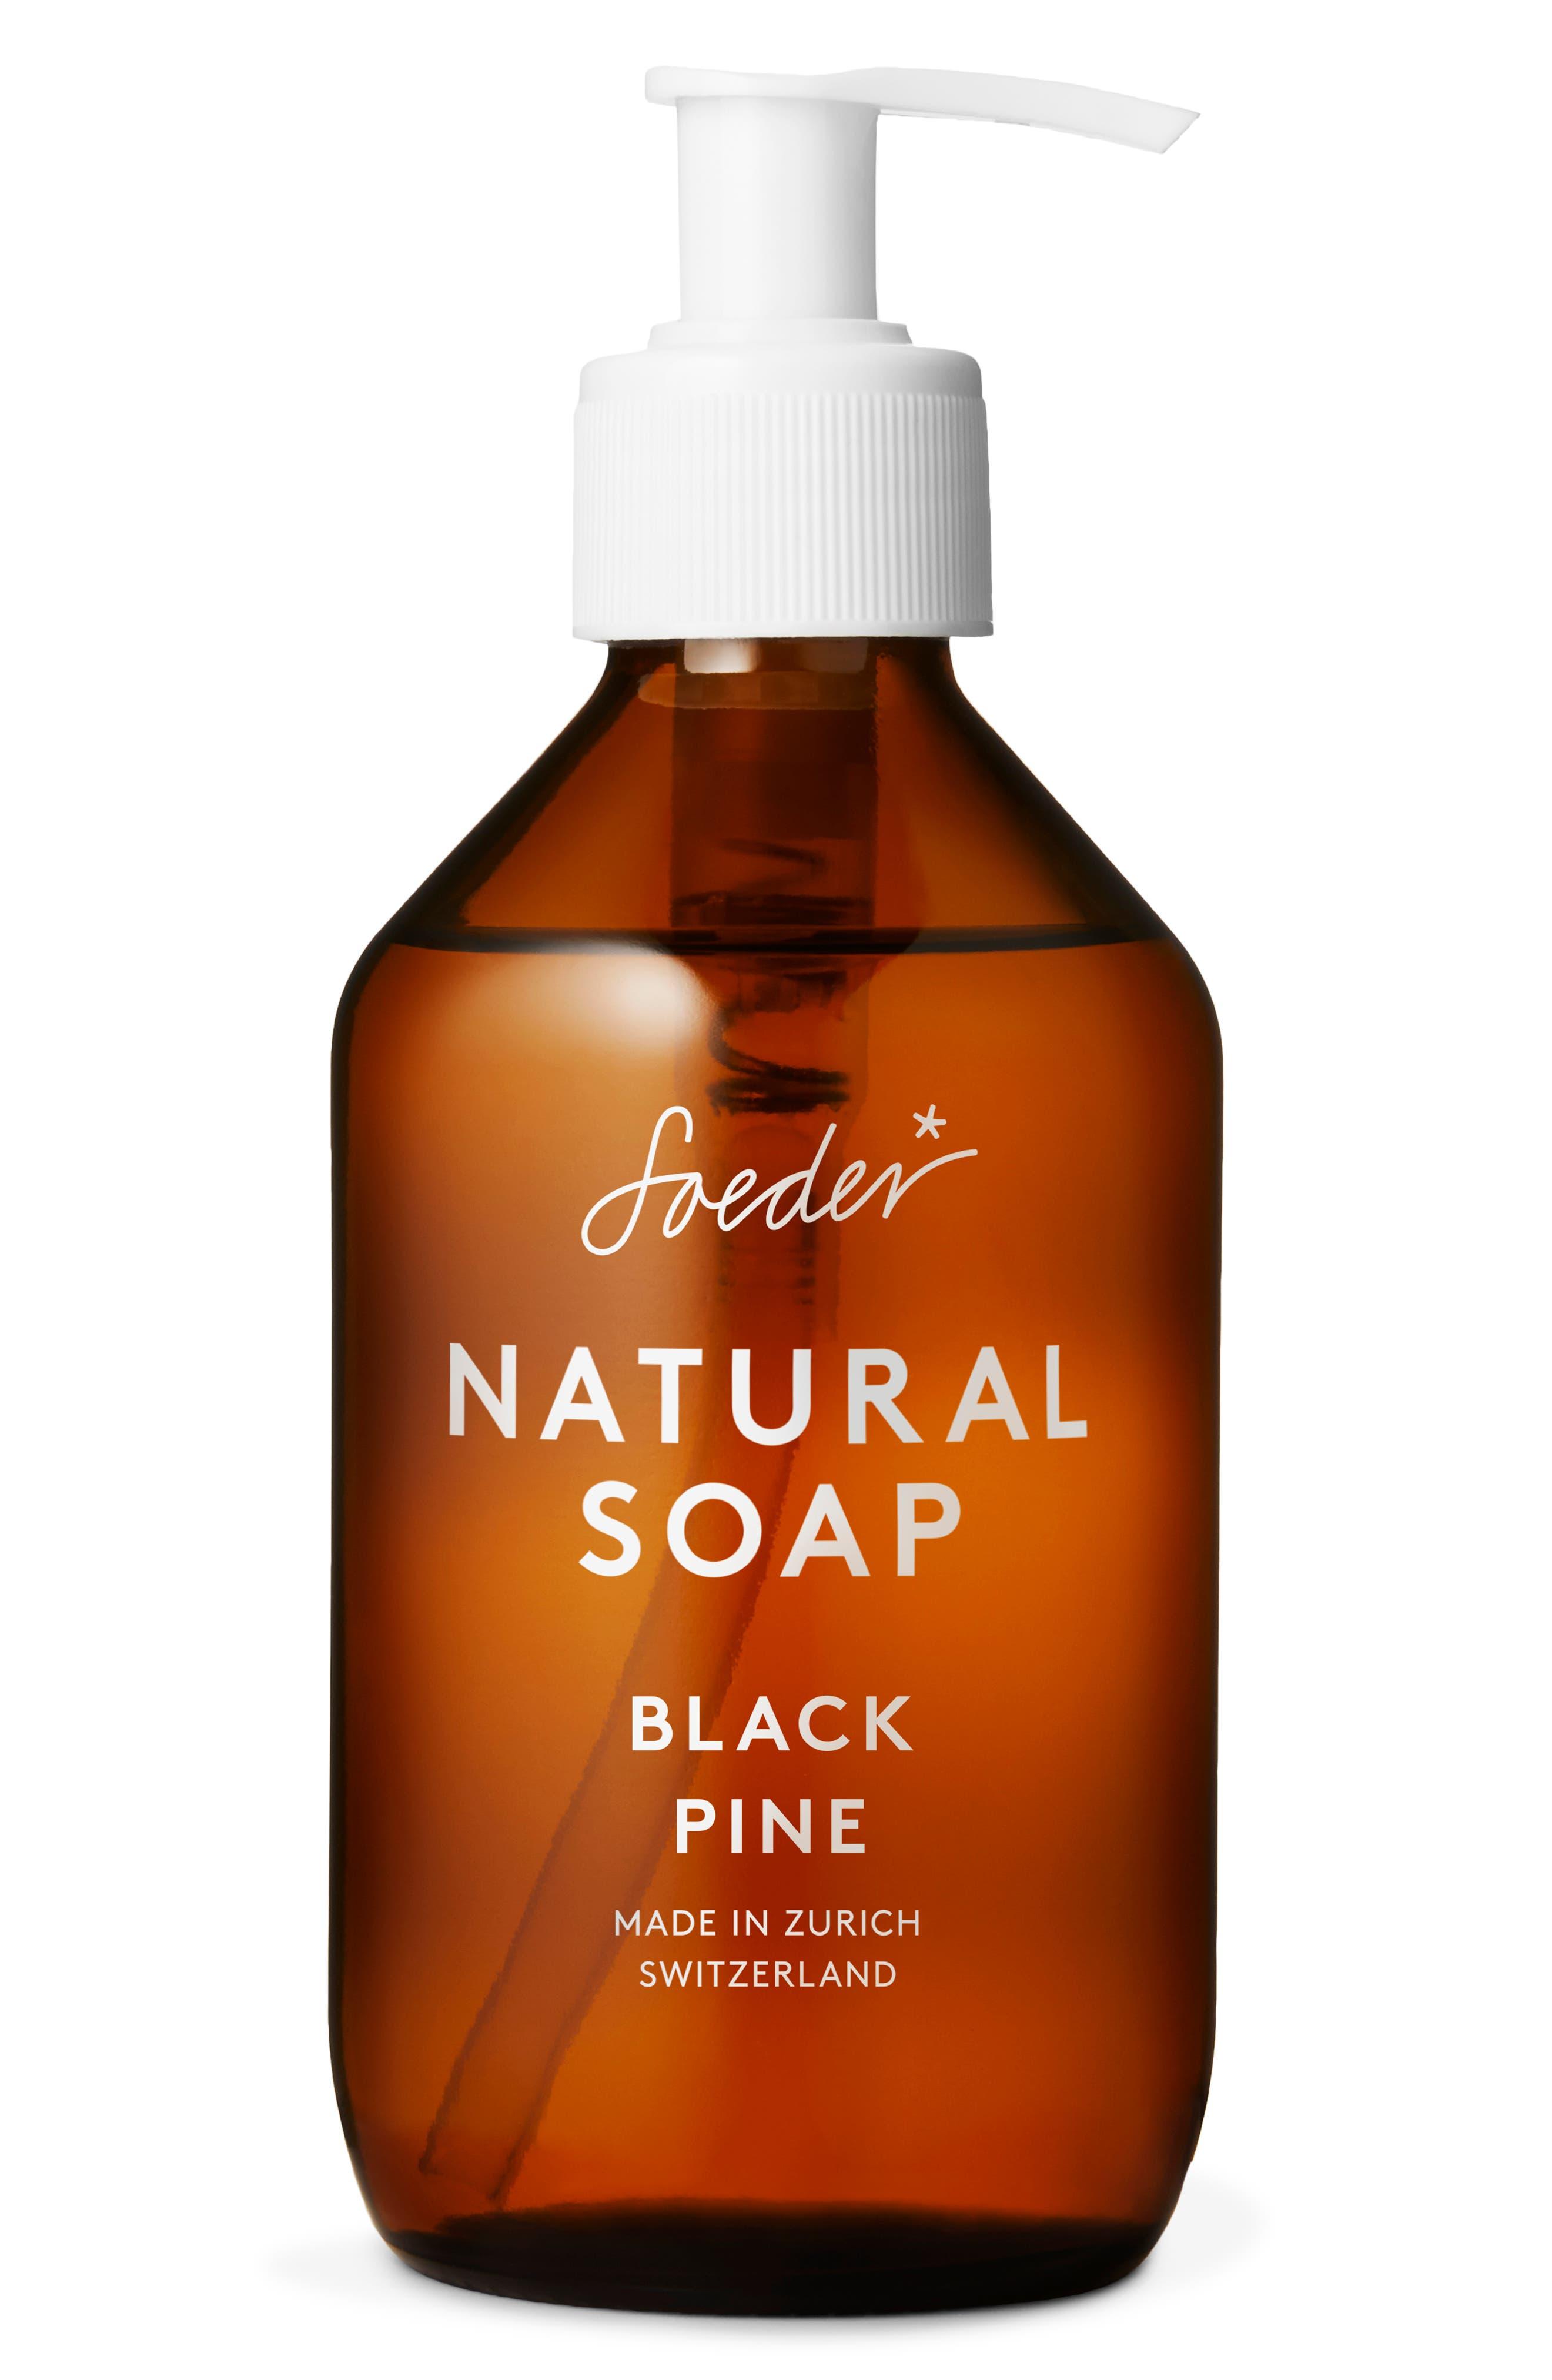 Natural Hand Soap | Nordstrom